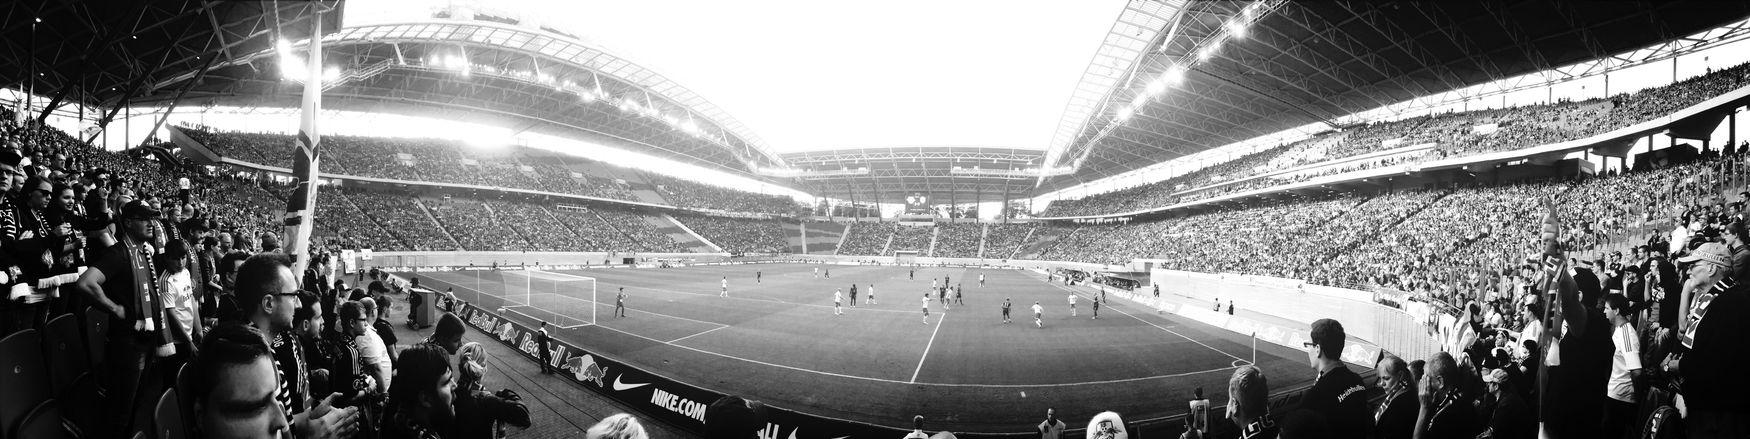 Game Fans Soccer